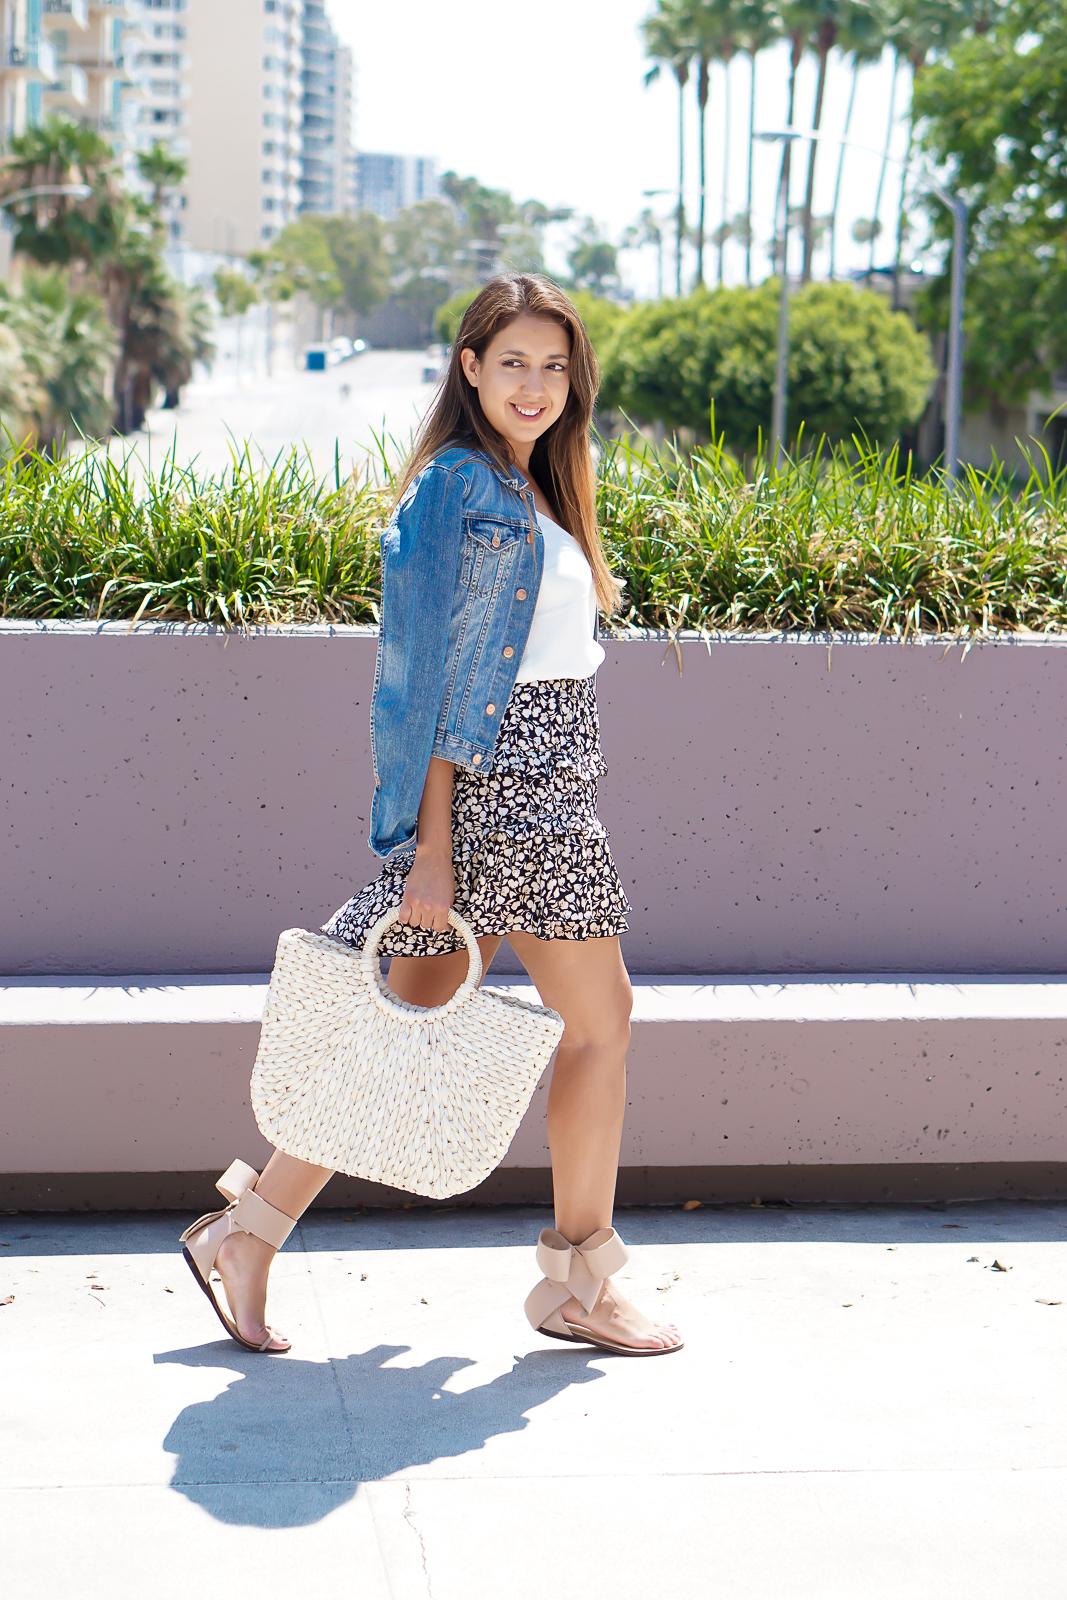 Amina Abdul Jillil Bow Sandals, Summer Straw Tote Bag, Who What Wear Ruffle Skirt, Summer Trends,